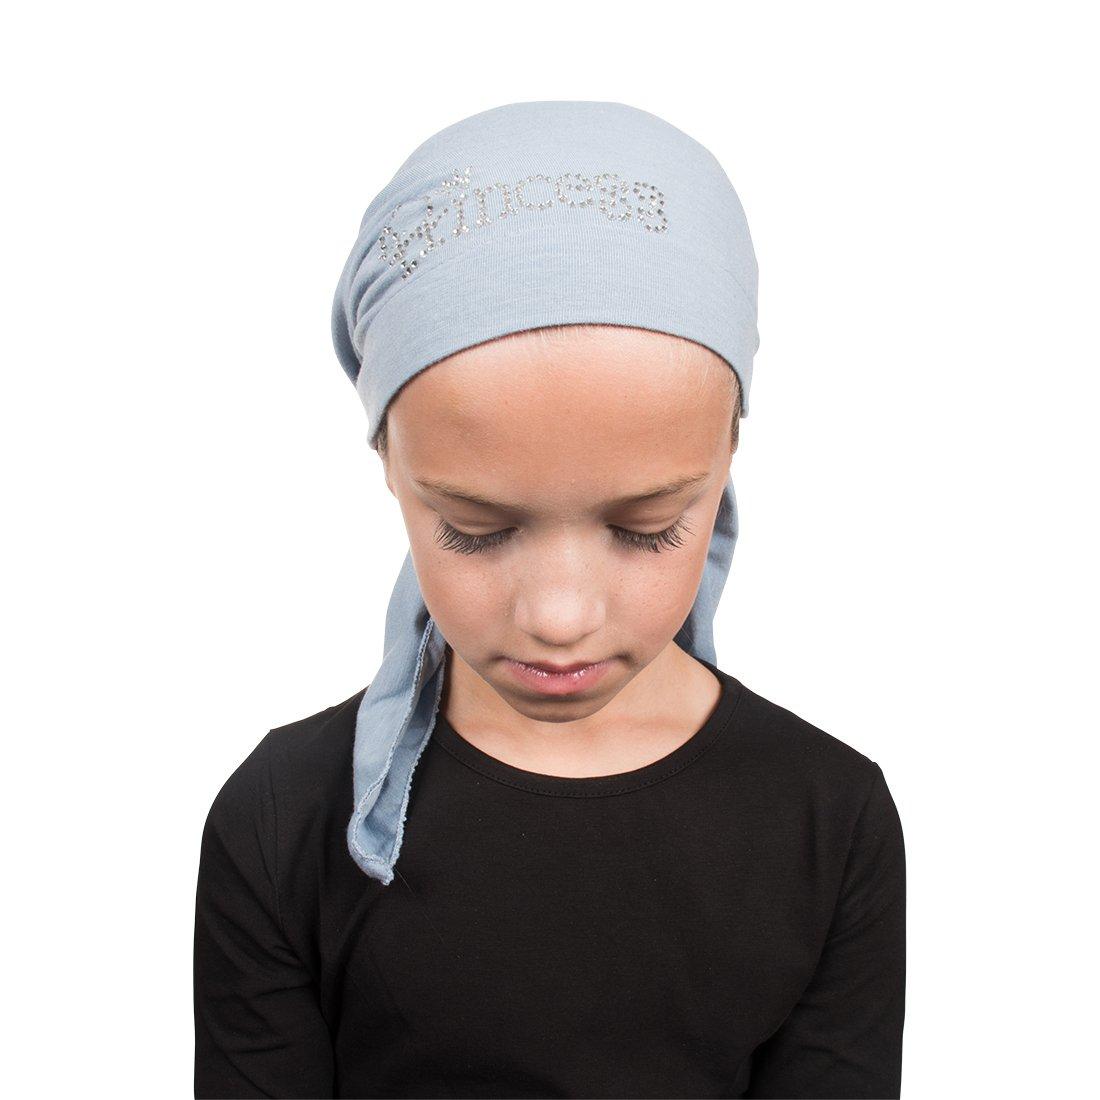 Princess Applique on Child's Pretied Head Scarf Cancer Cap Royal Landana Headscarves ldptk-a21-royal